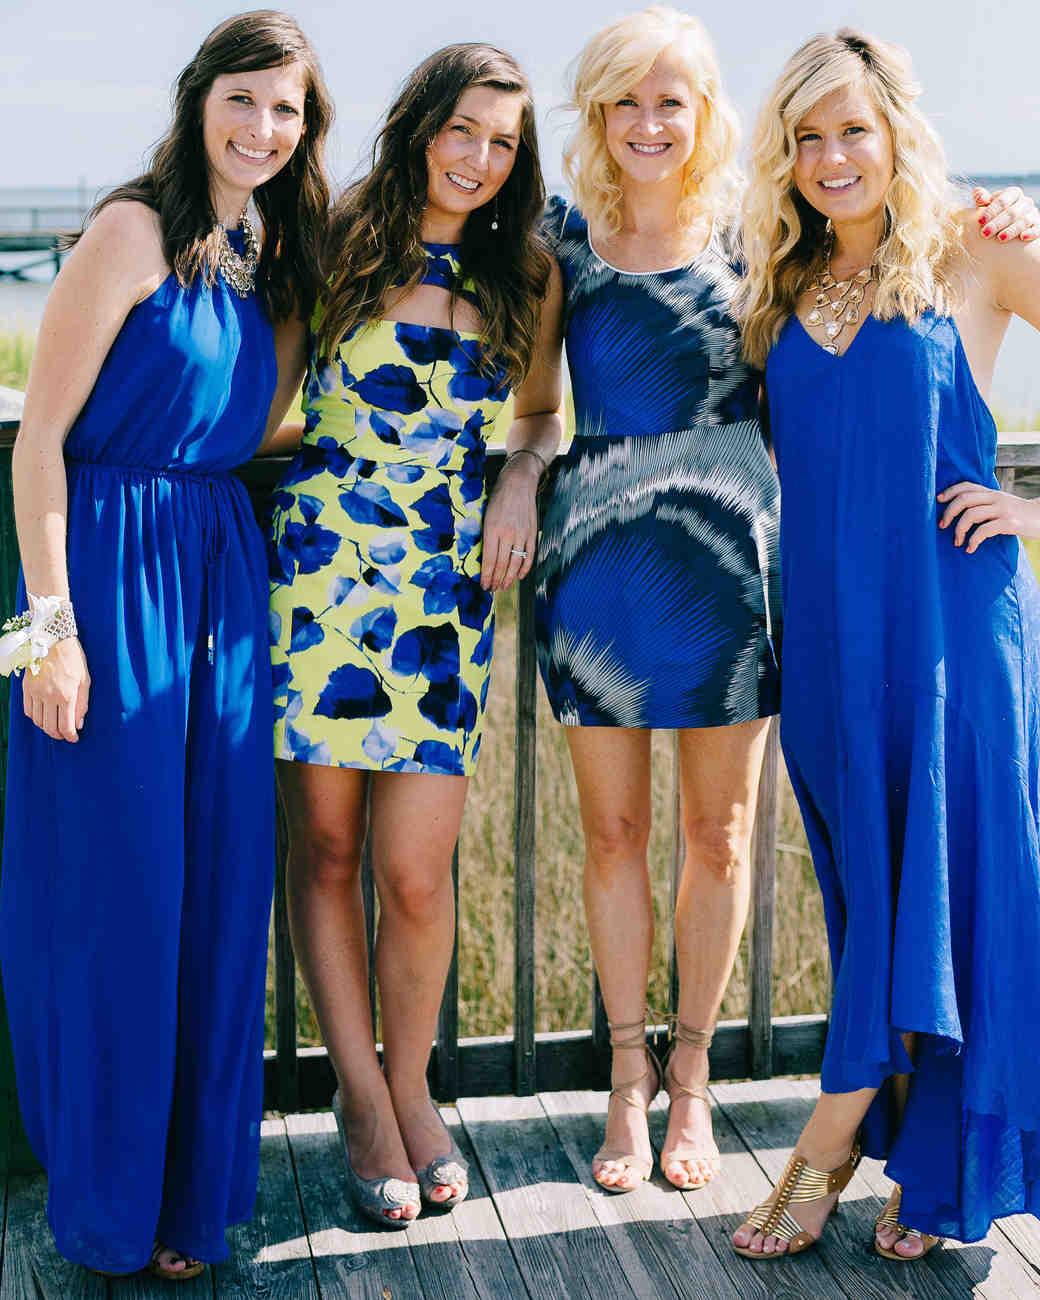 rachel-jurrie-nautical-wedding-bridesmaids-blue-0154-s112778-0416.jpg